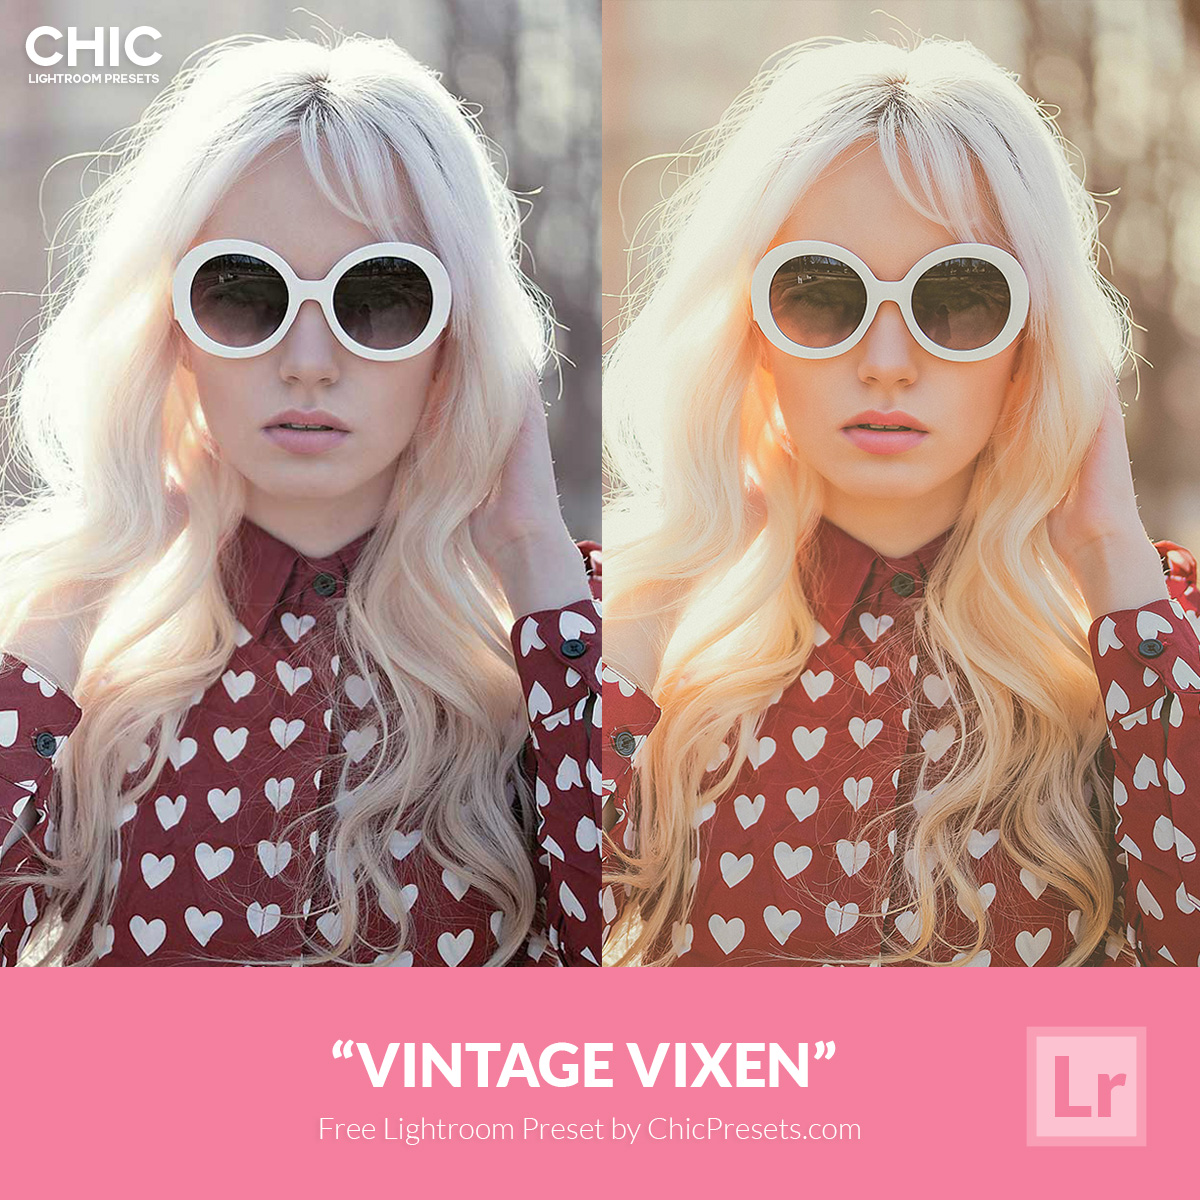 Chic-Vintage-Vixen